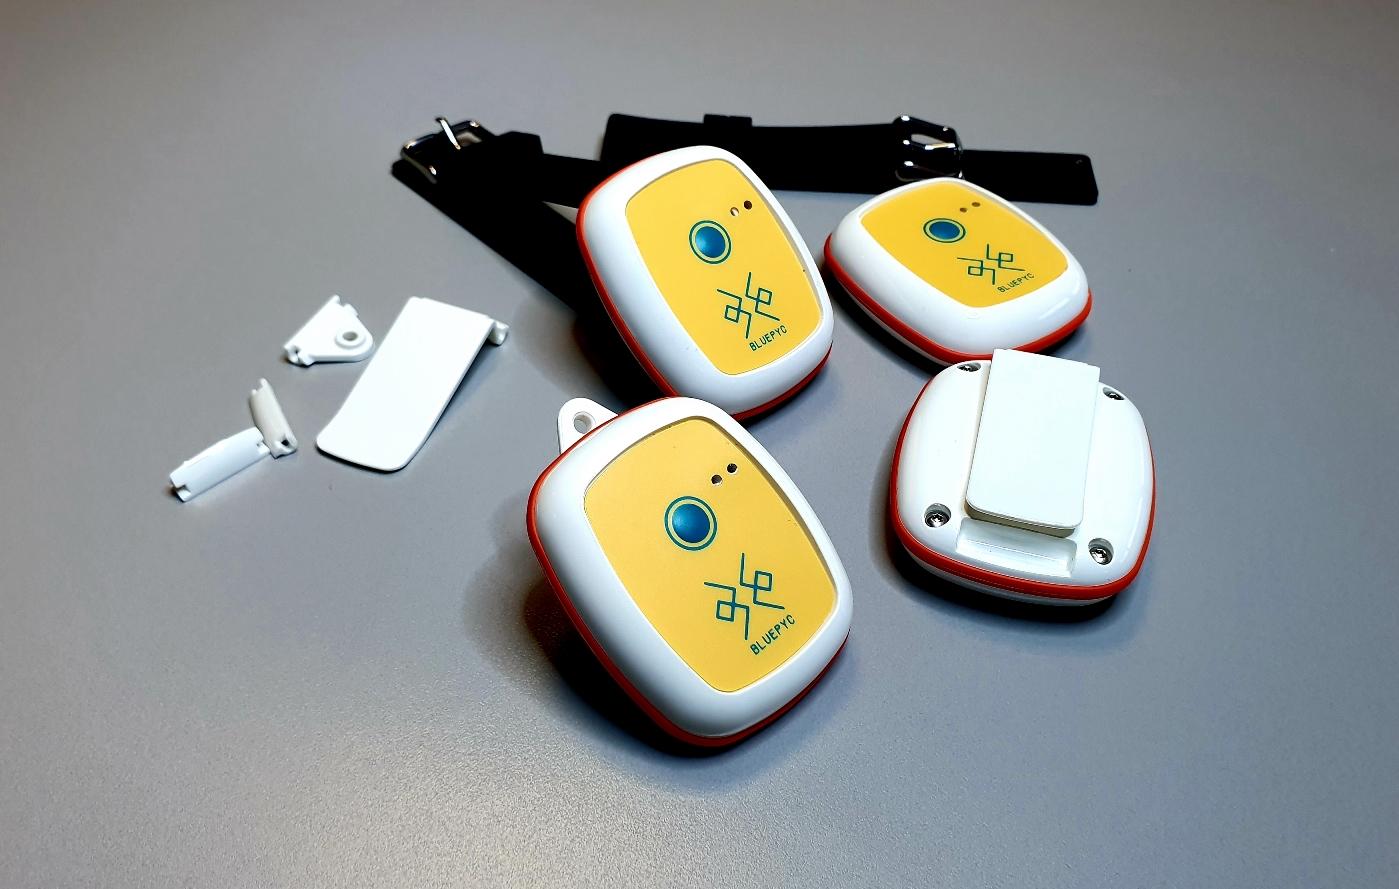 BluEpyc Sensor Beacon Wake-up Bluetooth Low Energy & accessori